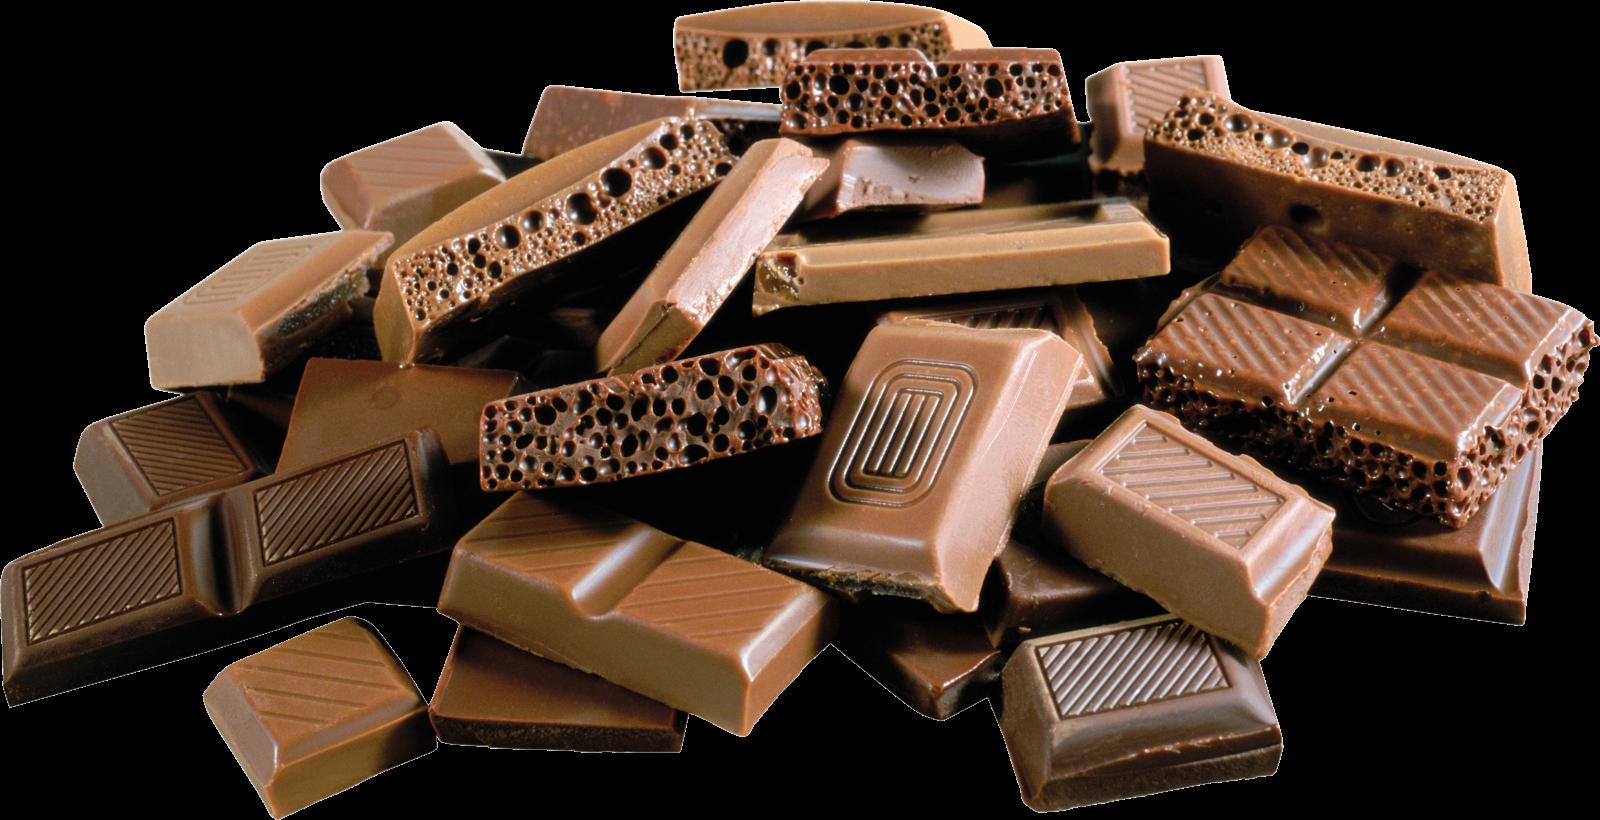 diarree van chocolade